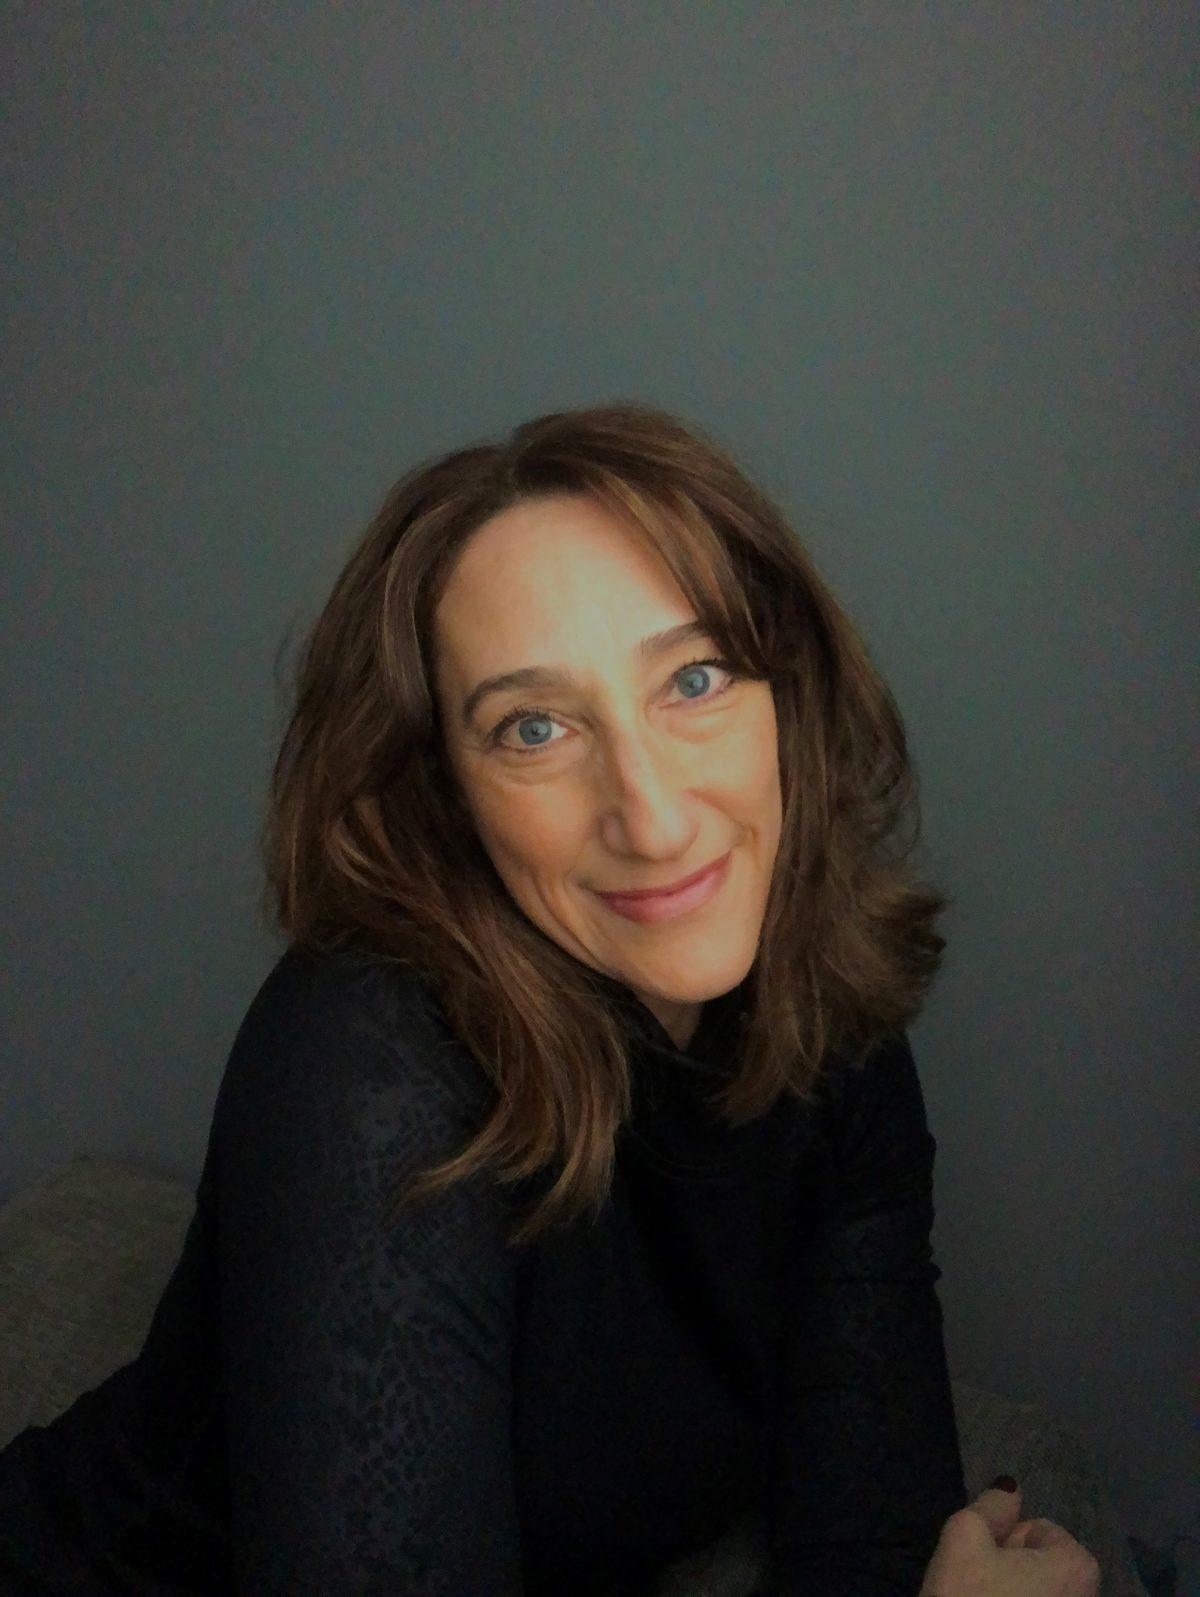 Danielle Kempton